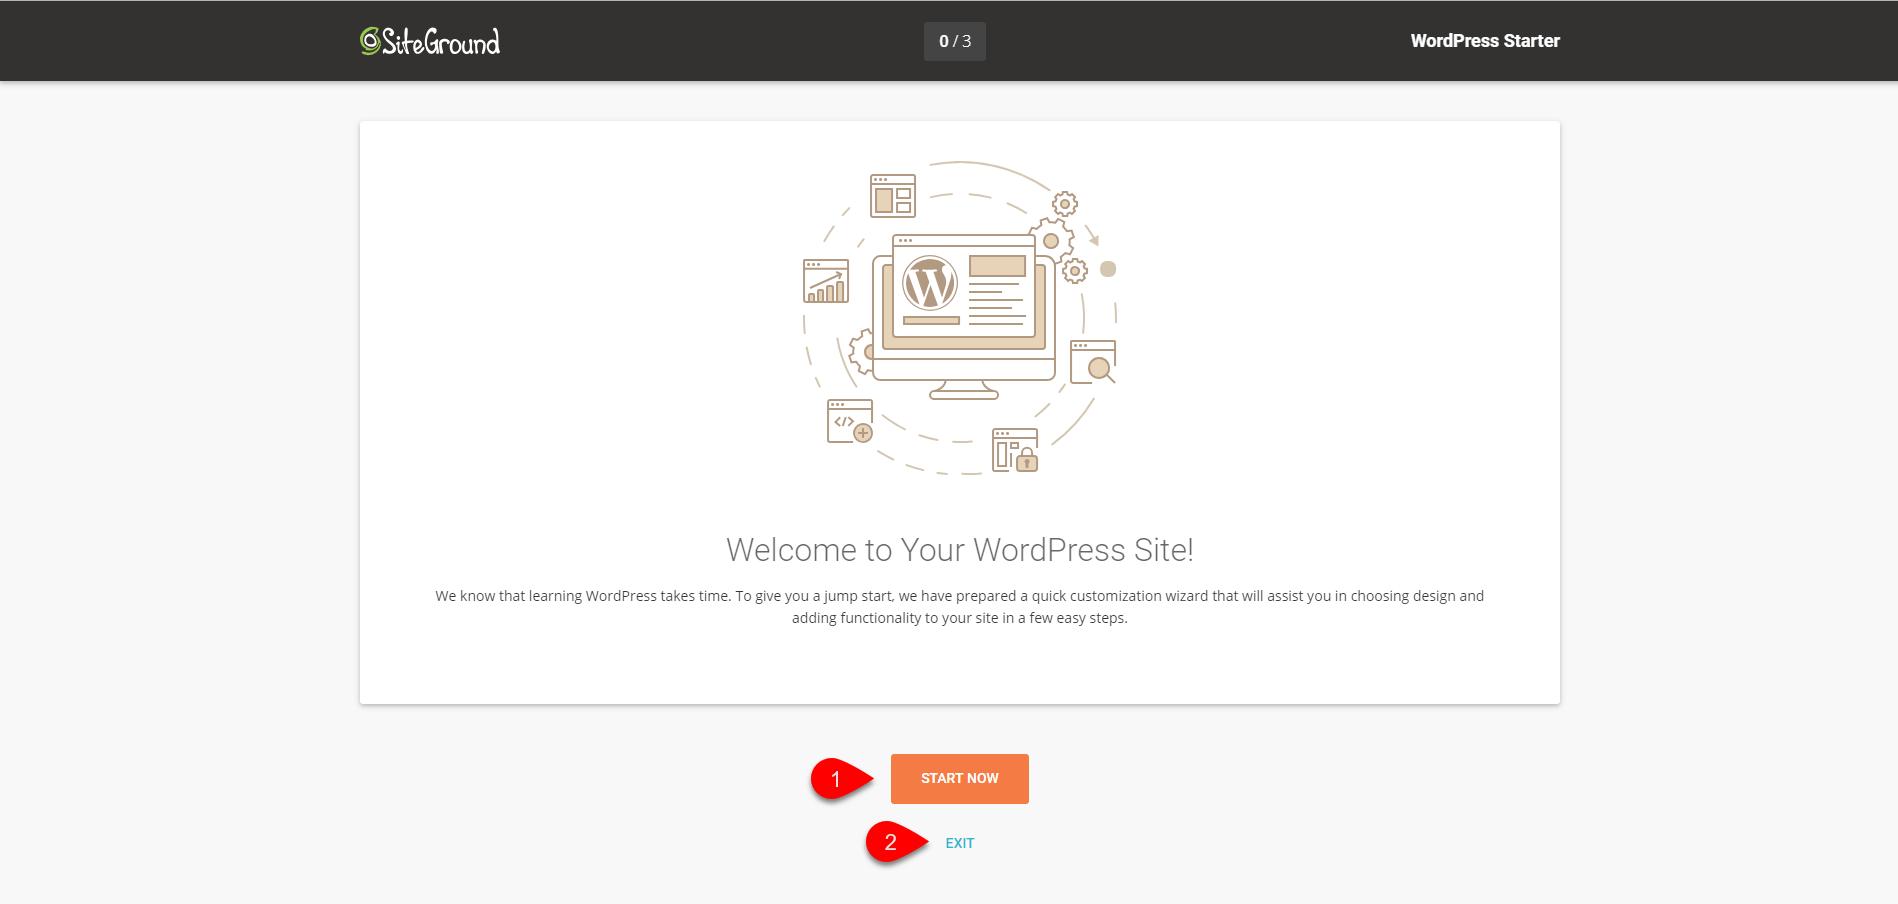 Installing WordPress on SiteGround 4